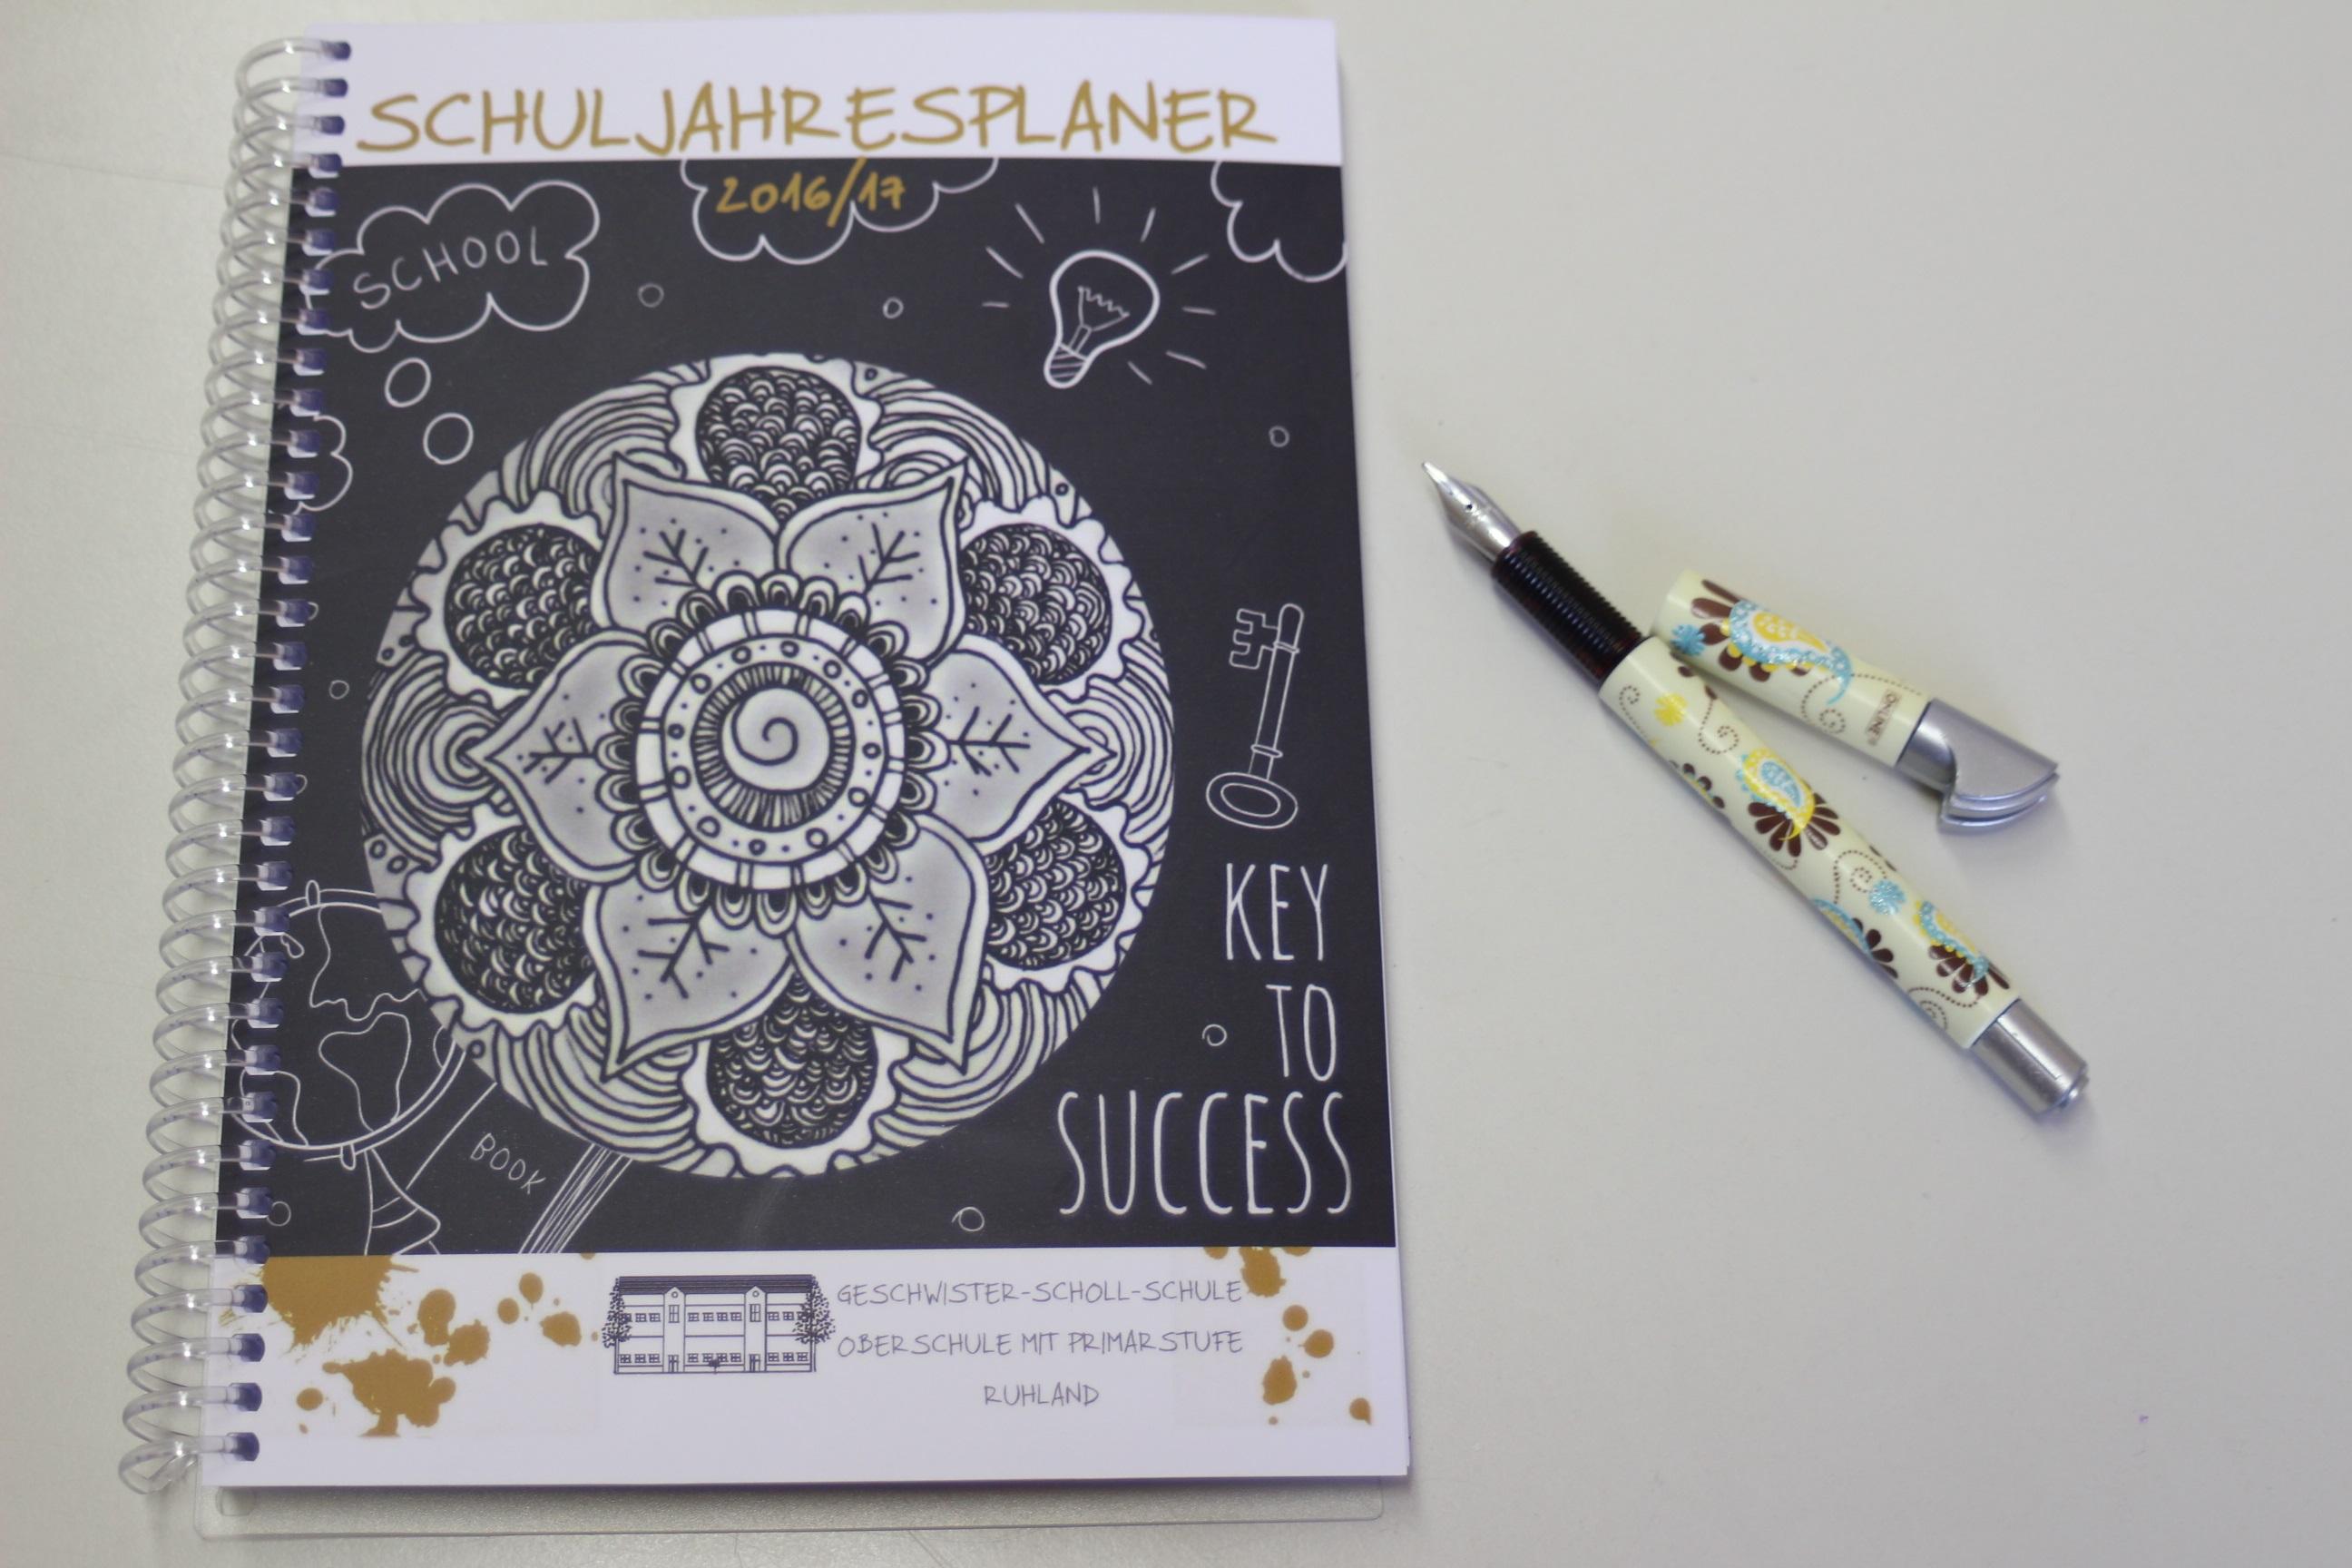 http://www.schuleruhland.de/wp-content/uploads/2016/04/Schulplaner2016_2017.jpg